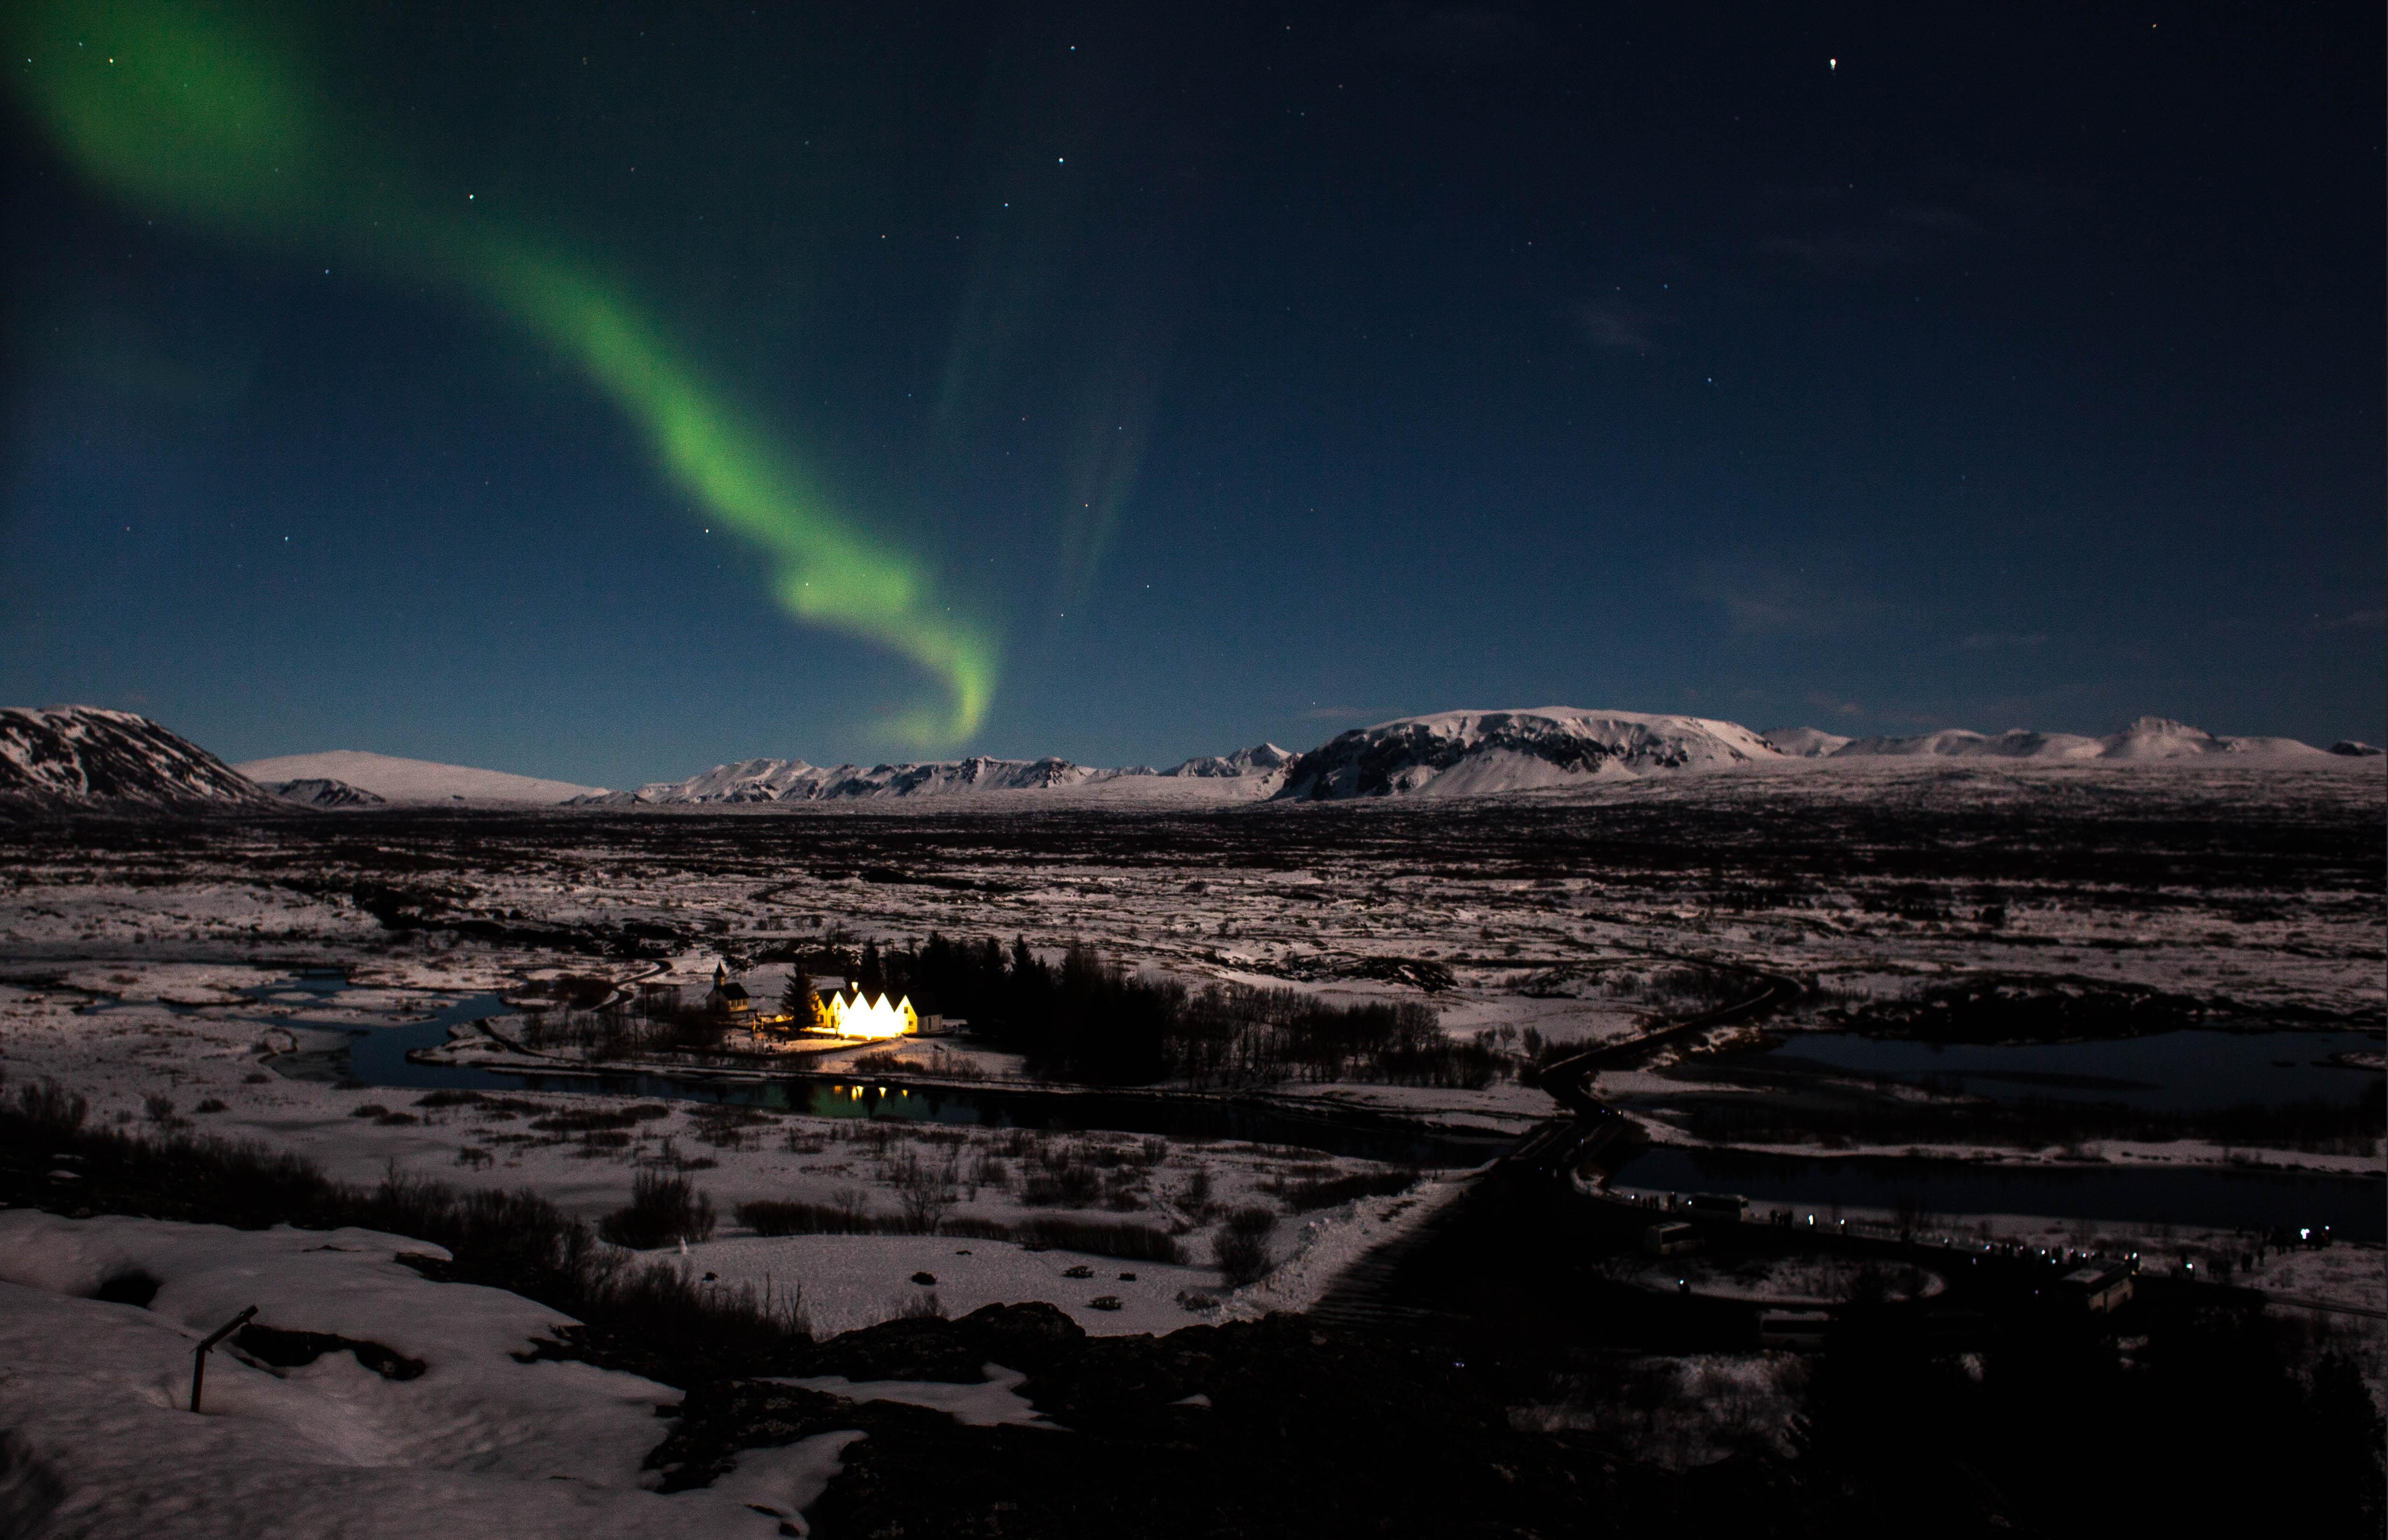 Embrace Friluftsliv: nordic philosophy of outdoor life